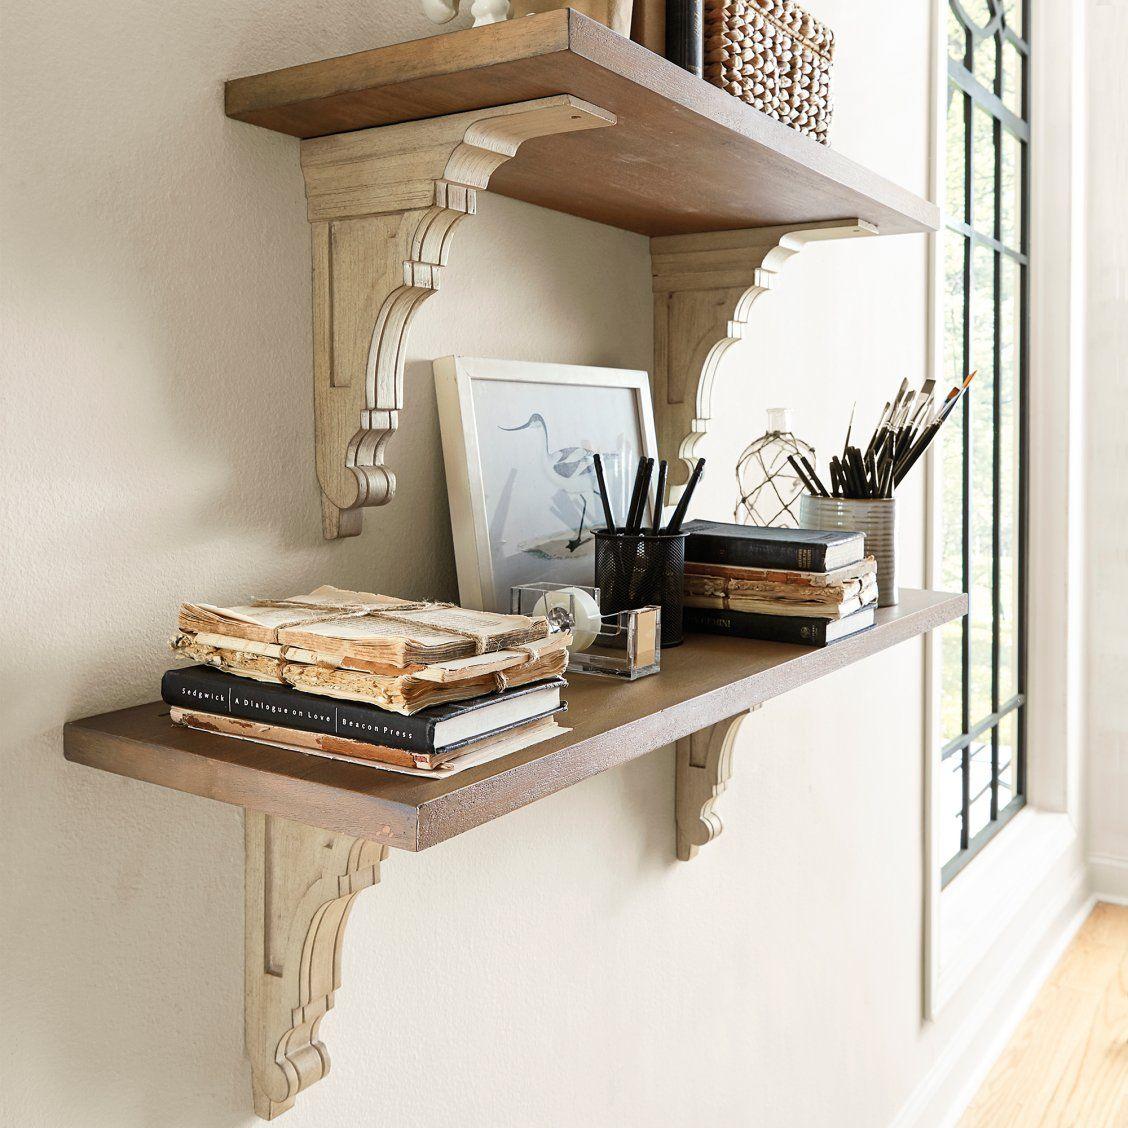 Lacquer Shelf Ballard Designs Decor Floating Shelves Shelves